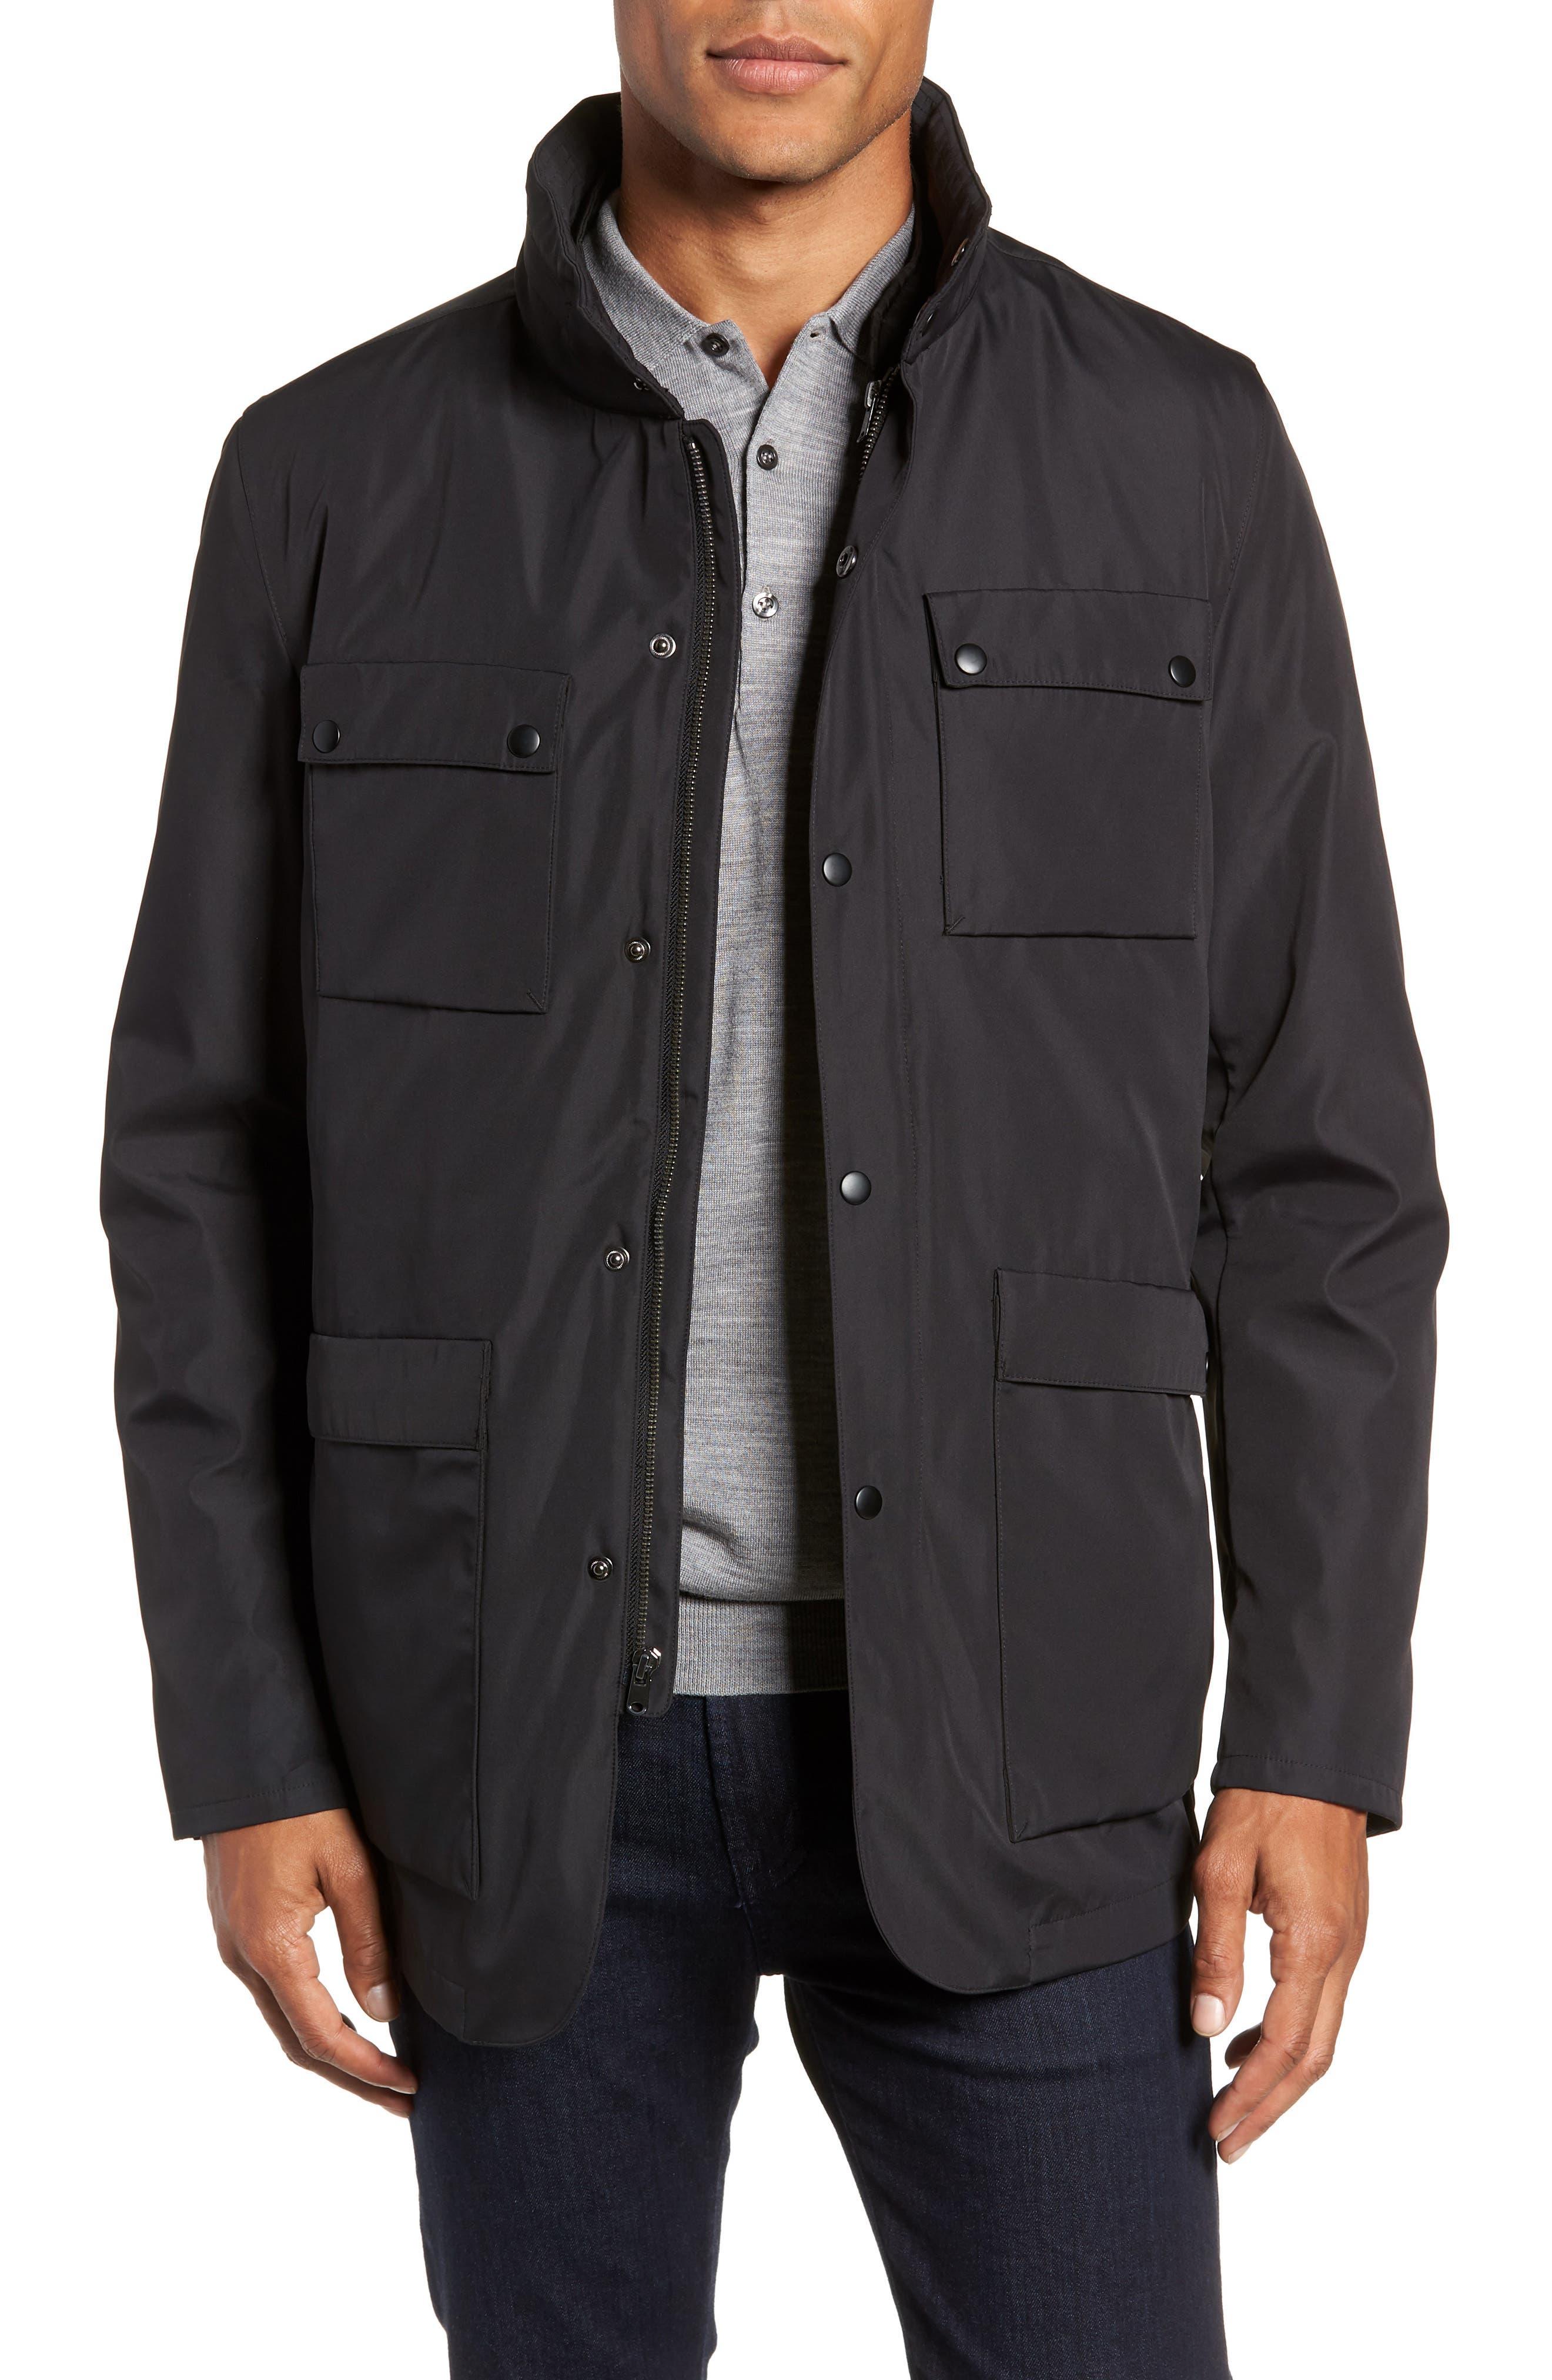 Oak 3-in-1 Jacket,                             Main thumbnail 1, color,                             BLACK